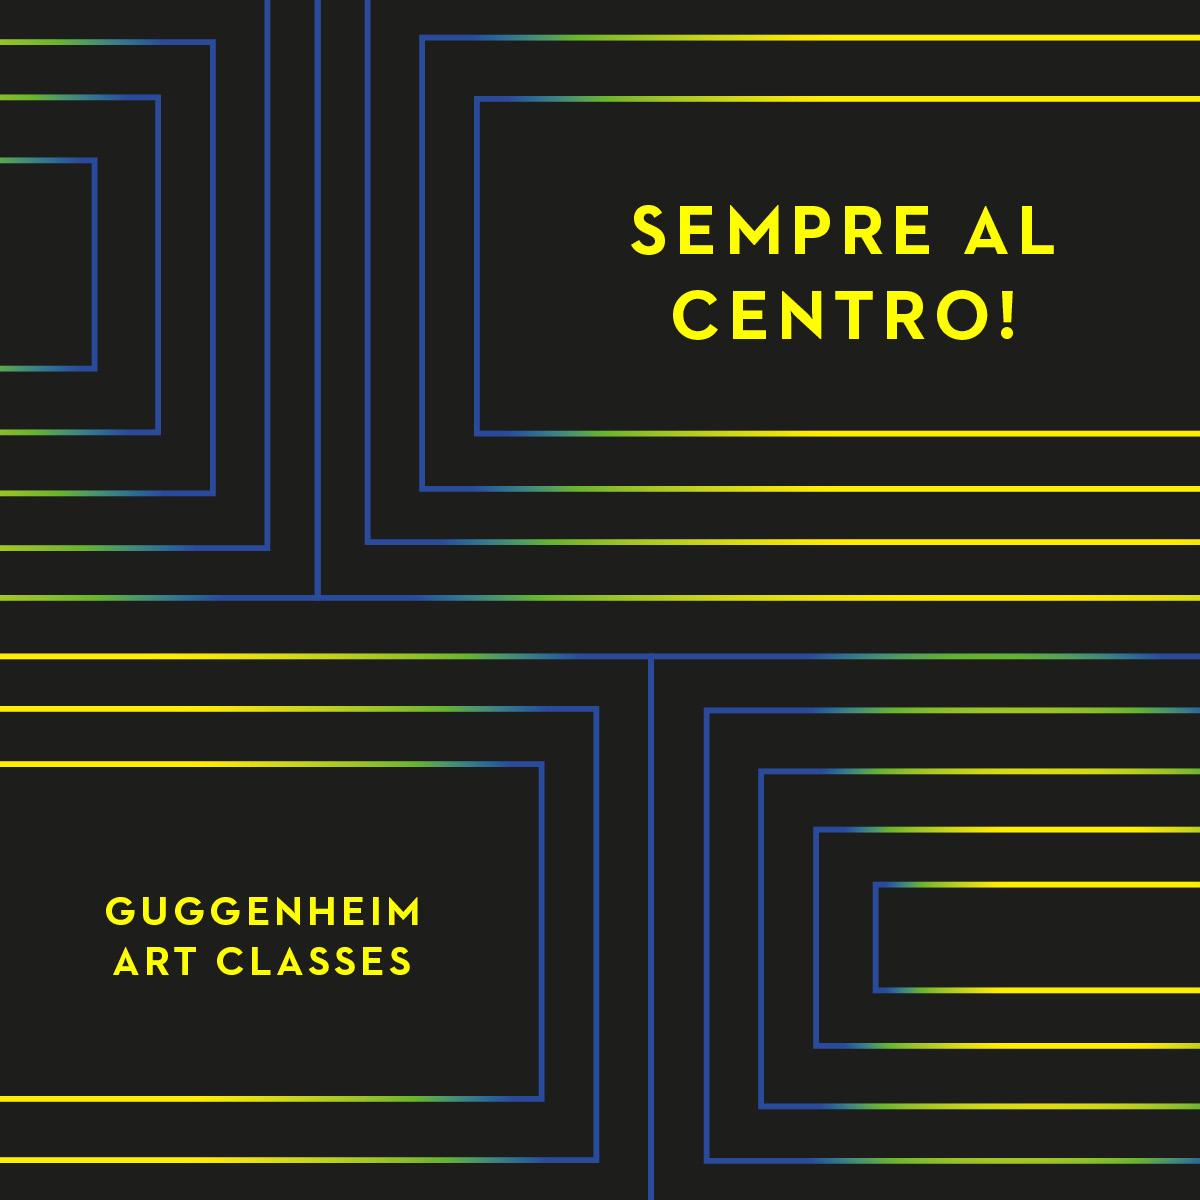 Guggenheim-Art-ClassesSempre-al-centro